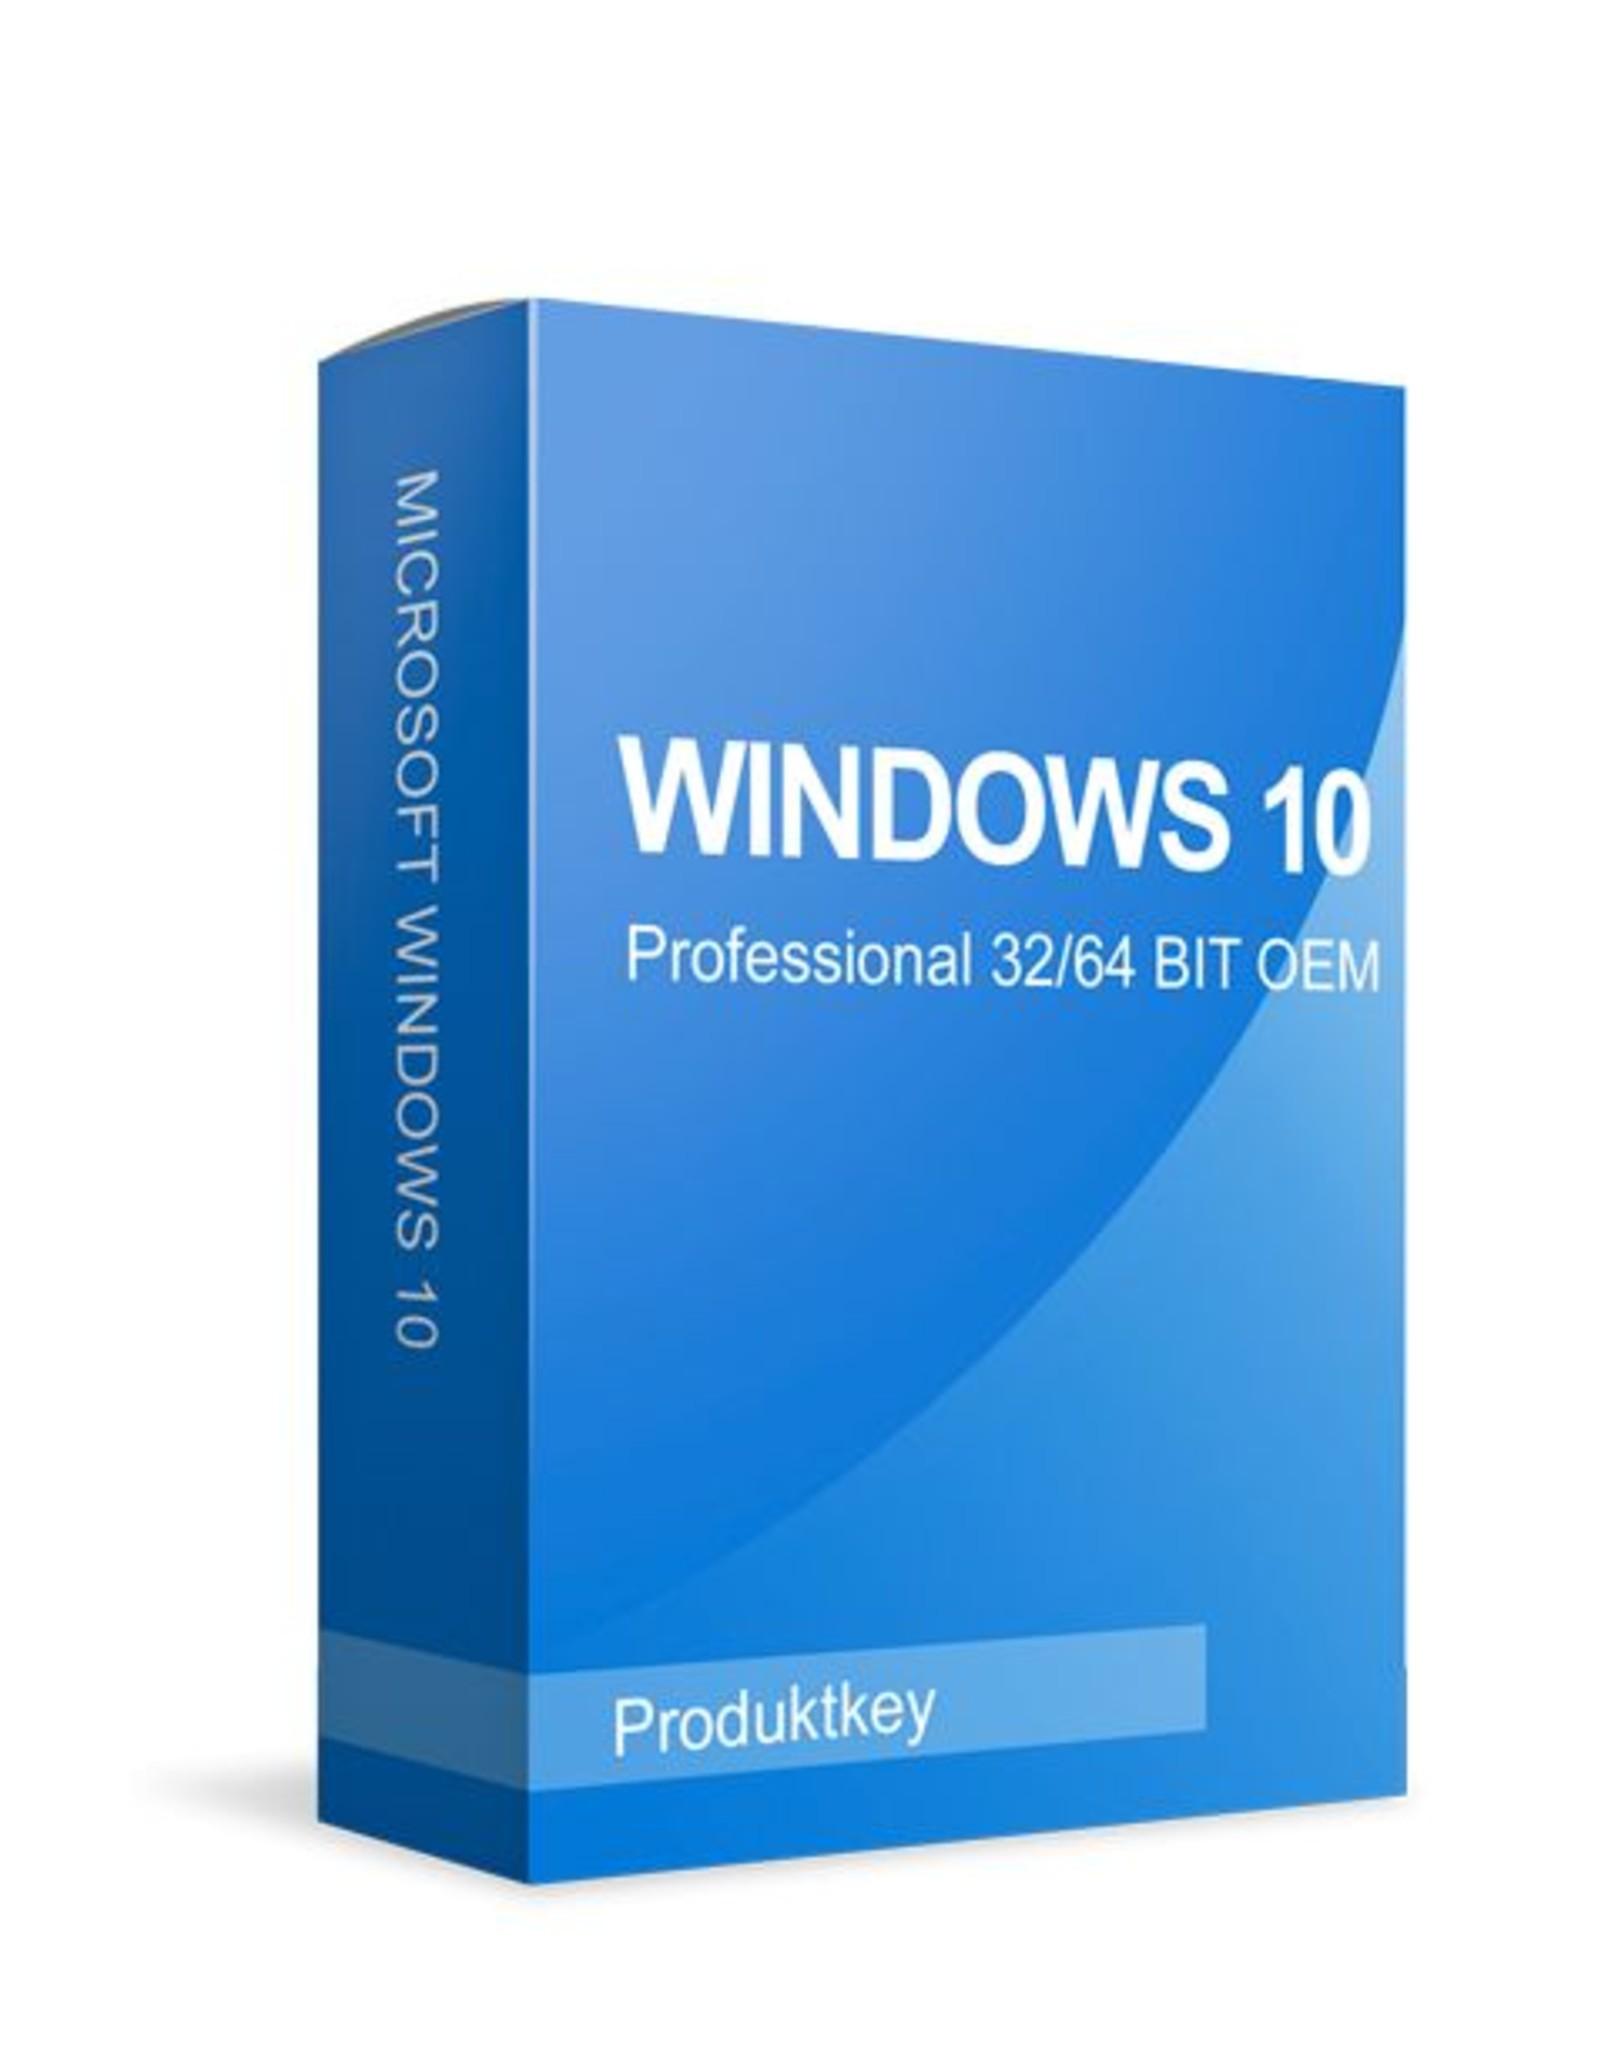 Microsoft Windows 10 Professional alle talen 32/64 bits digitaal levering